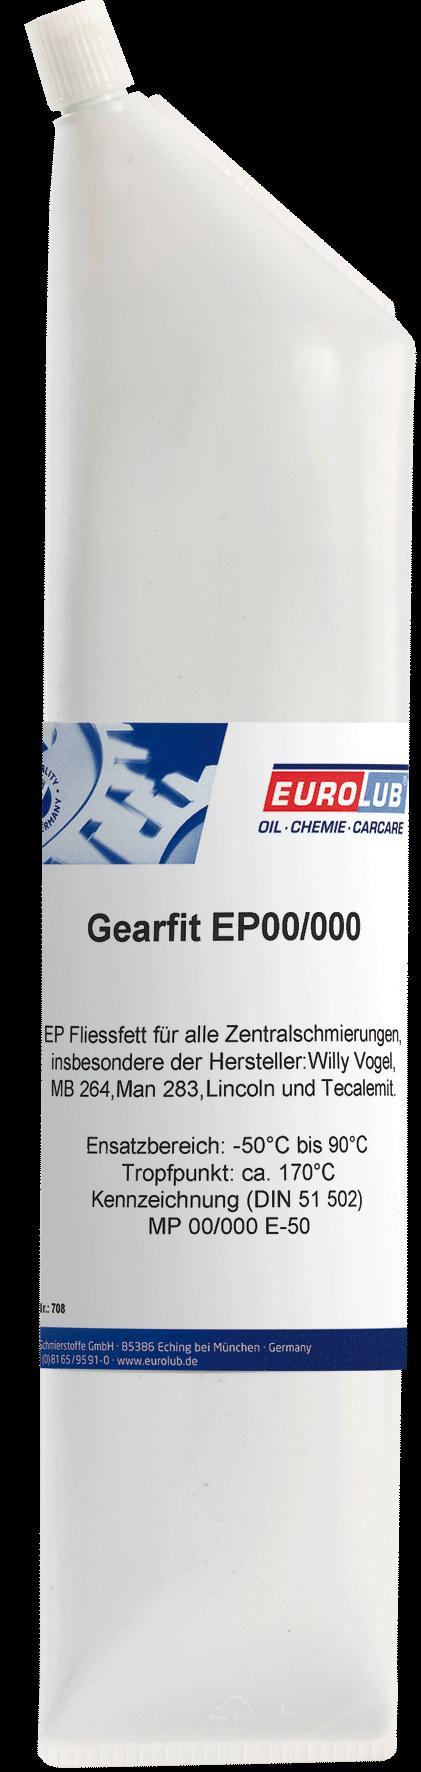 Eurolub Gearfit EP00/000 (смазка для централизованных систем), 0.9л